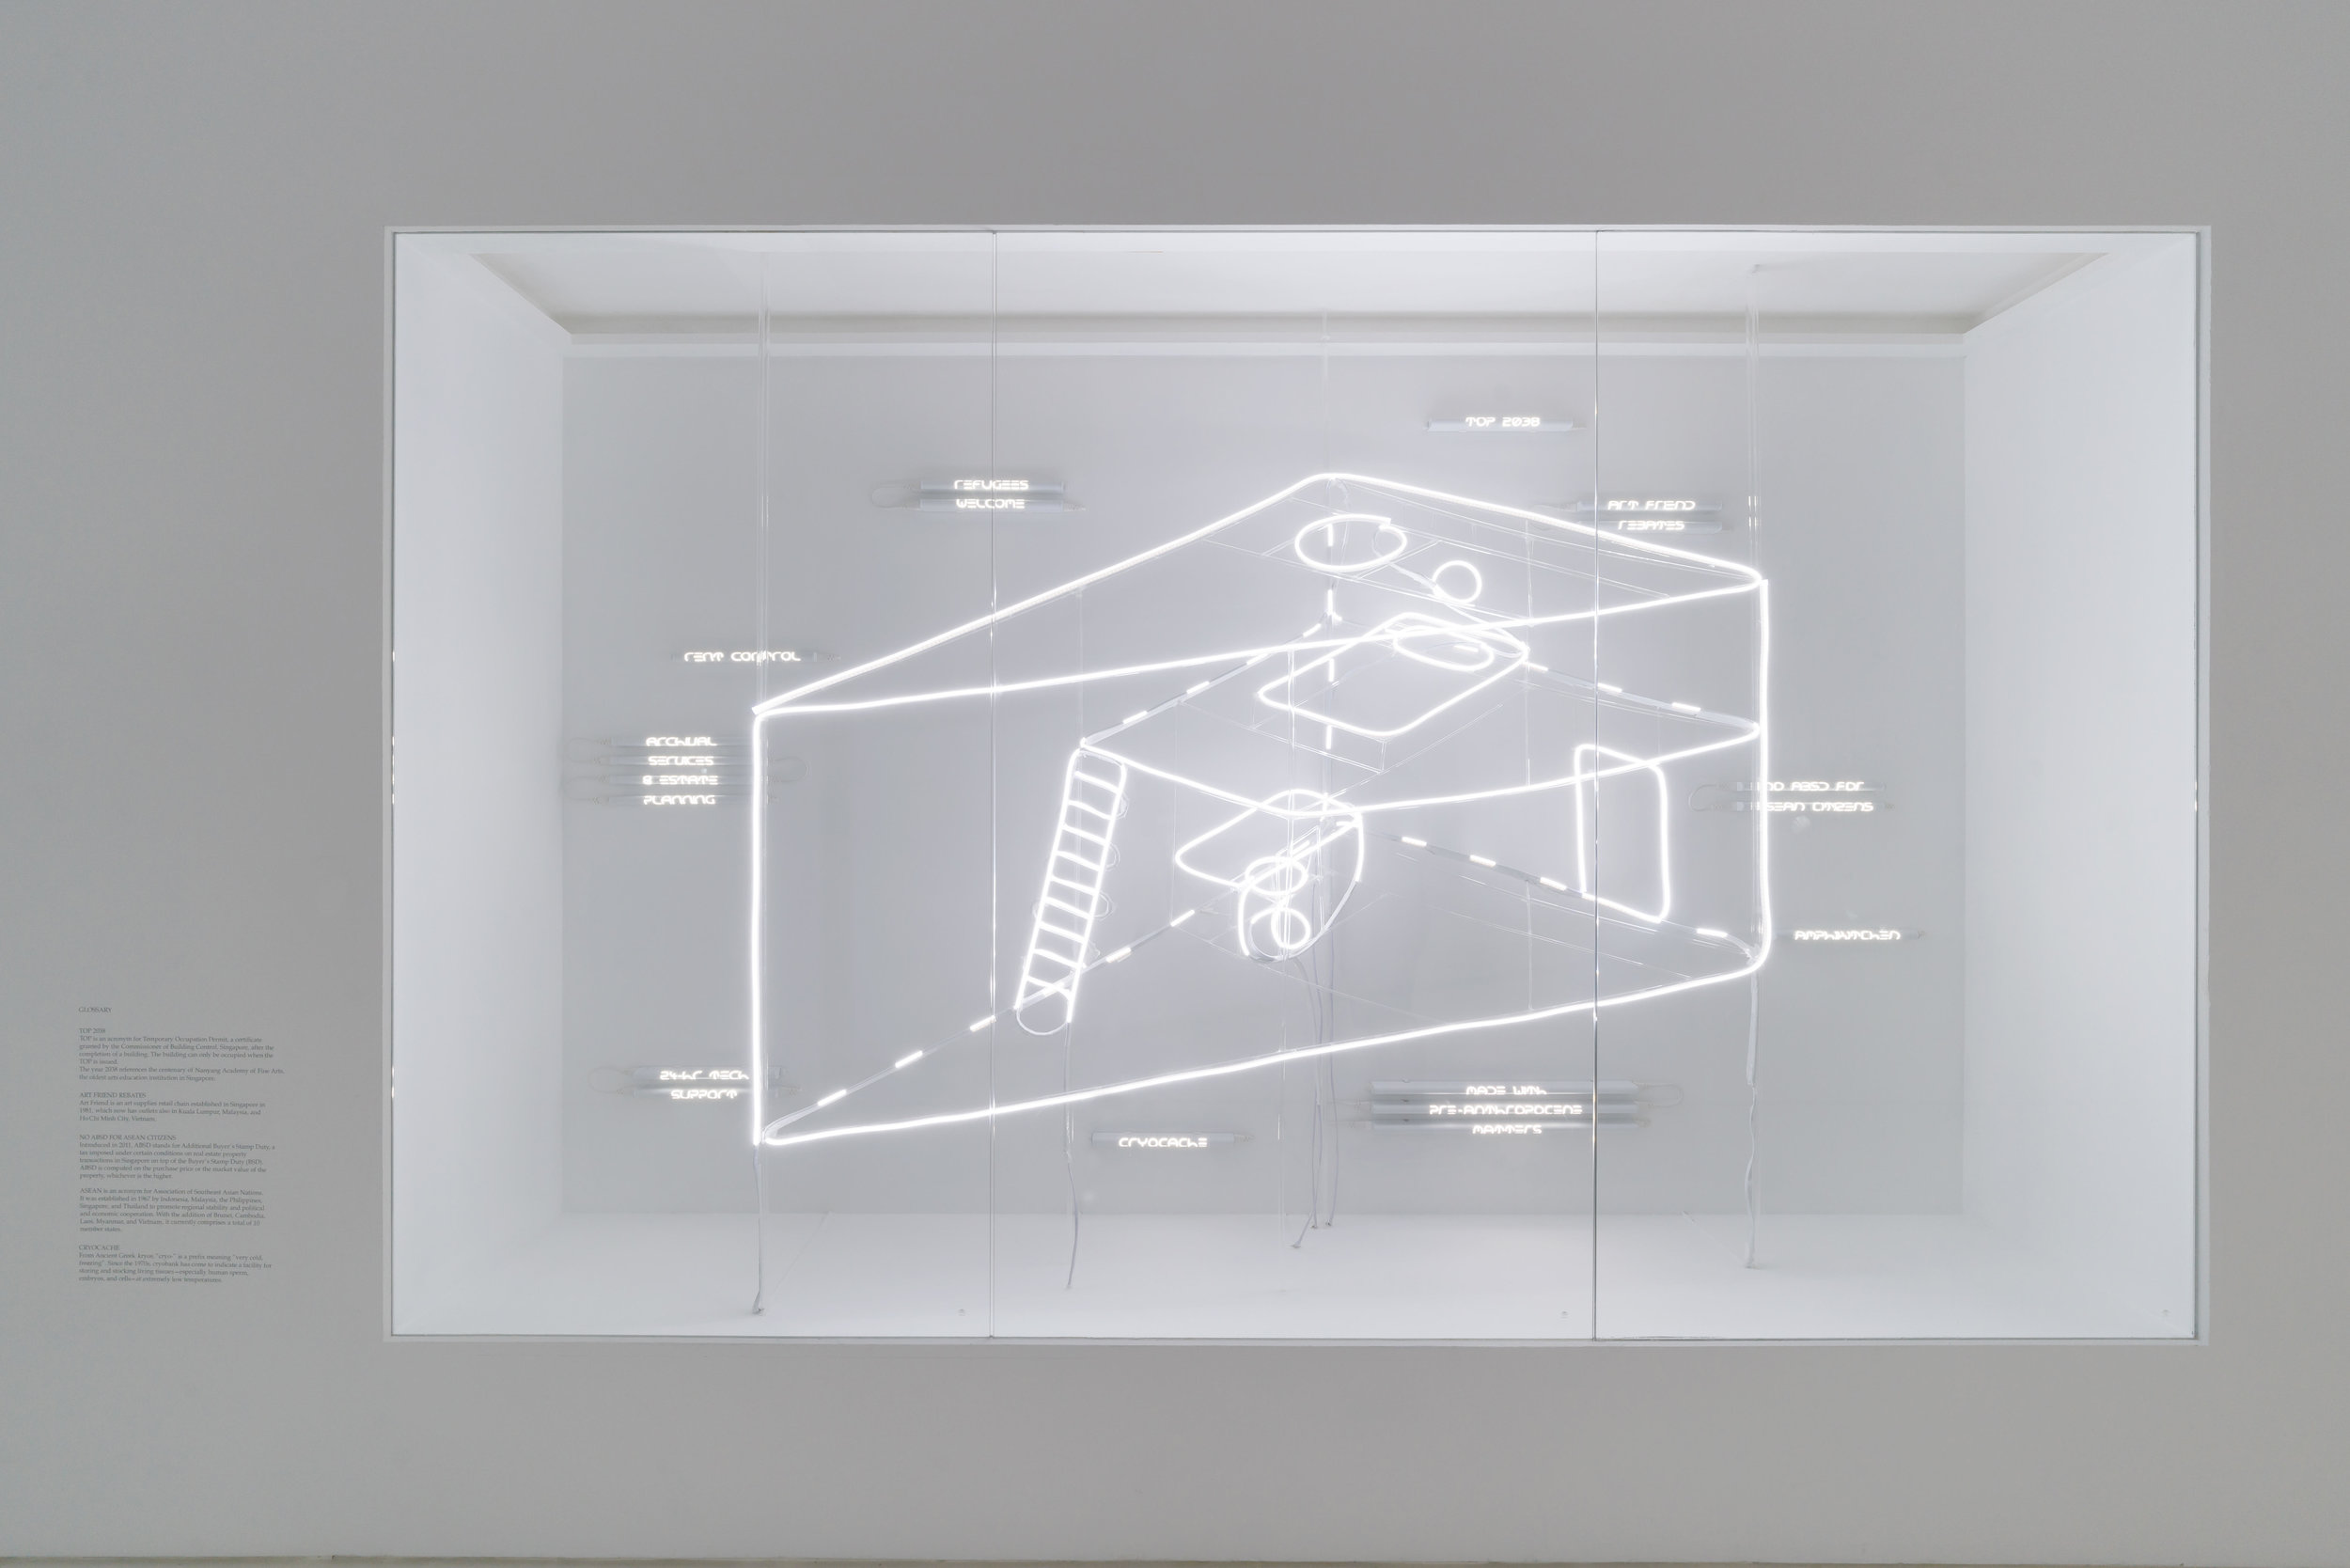 Michael Lee, Creatif Compleks, project in The Vitrine, NTU CCA Singapore, 17 March – 9 September 2018, installation view. Courtesy NTU CCA Singapore.